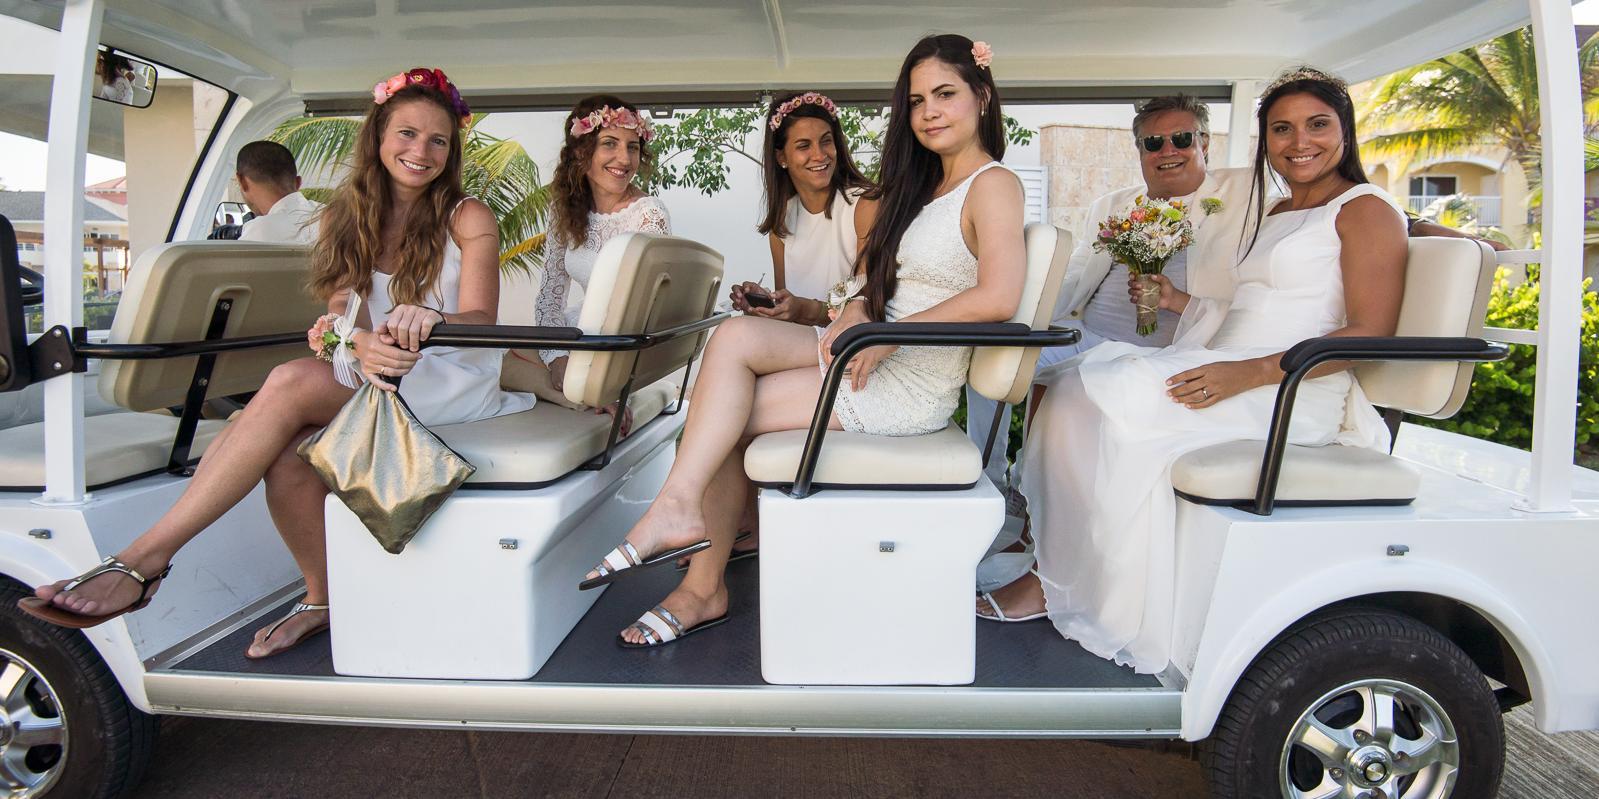 bodas-rustico-playa-cuba-6311.jpg